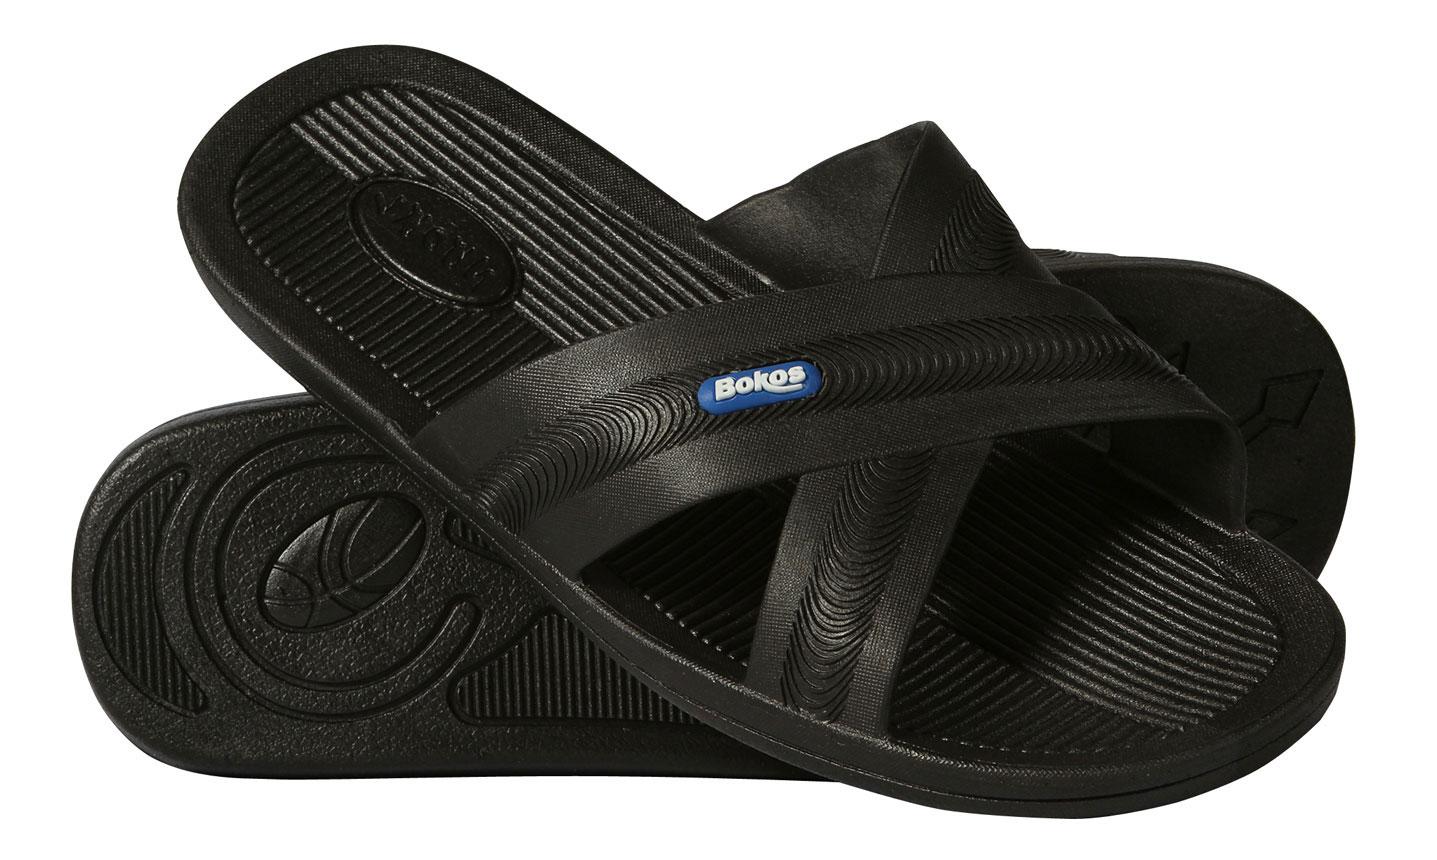 2e74e99841bc Bokos-Men-039-s-Rubber-Sandals thumbnail 3